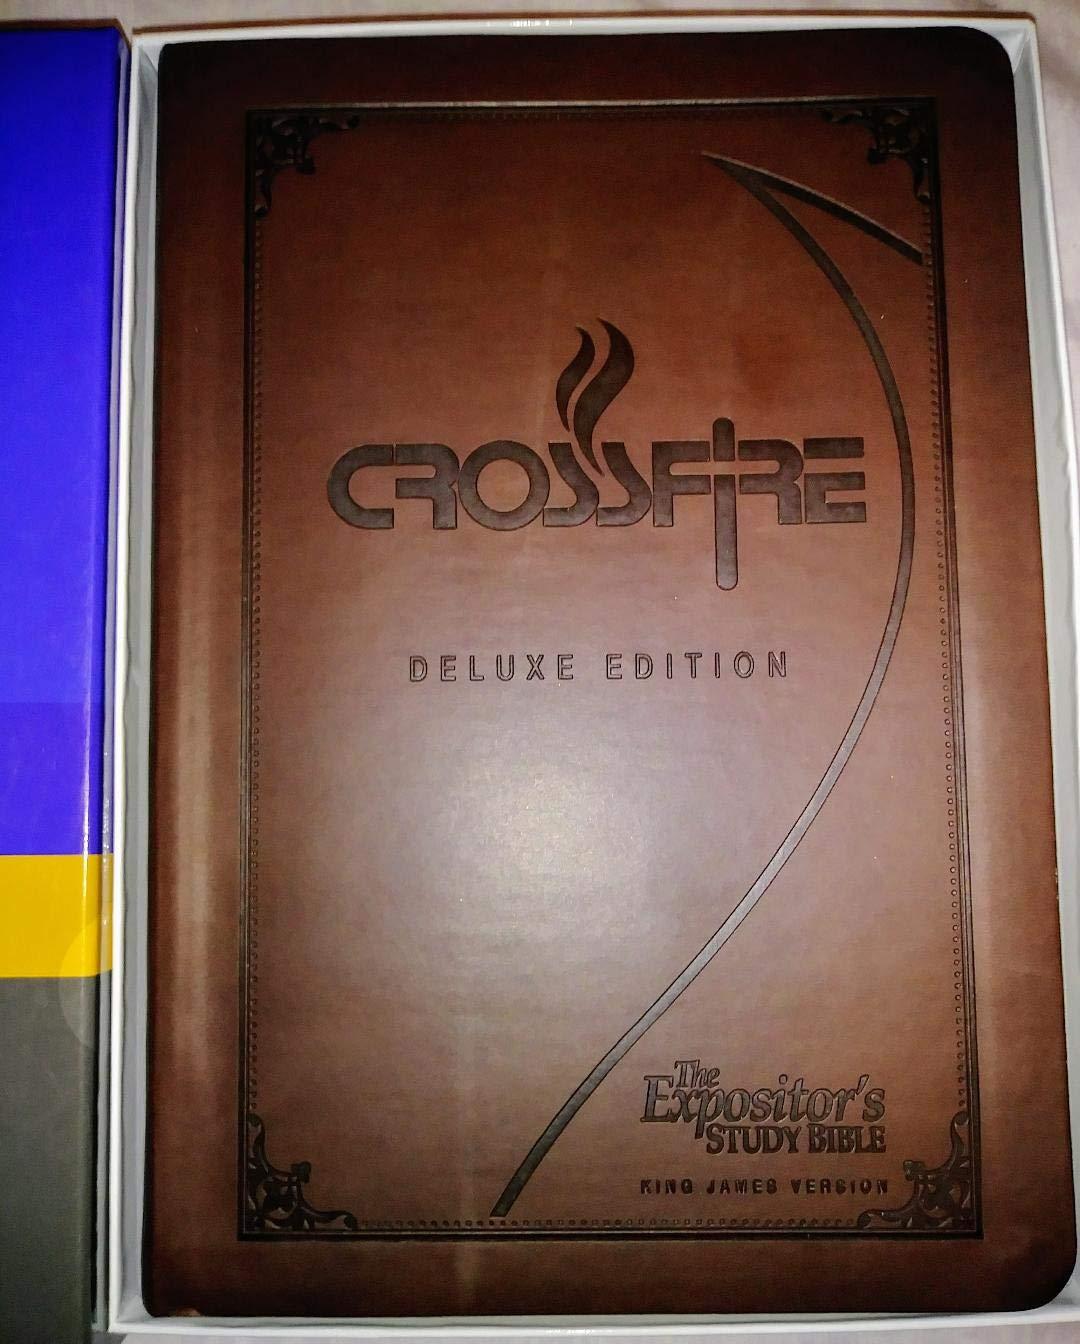 Expositor's Study Bible KJV Crossfire Deluxe: Gabriel